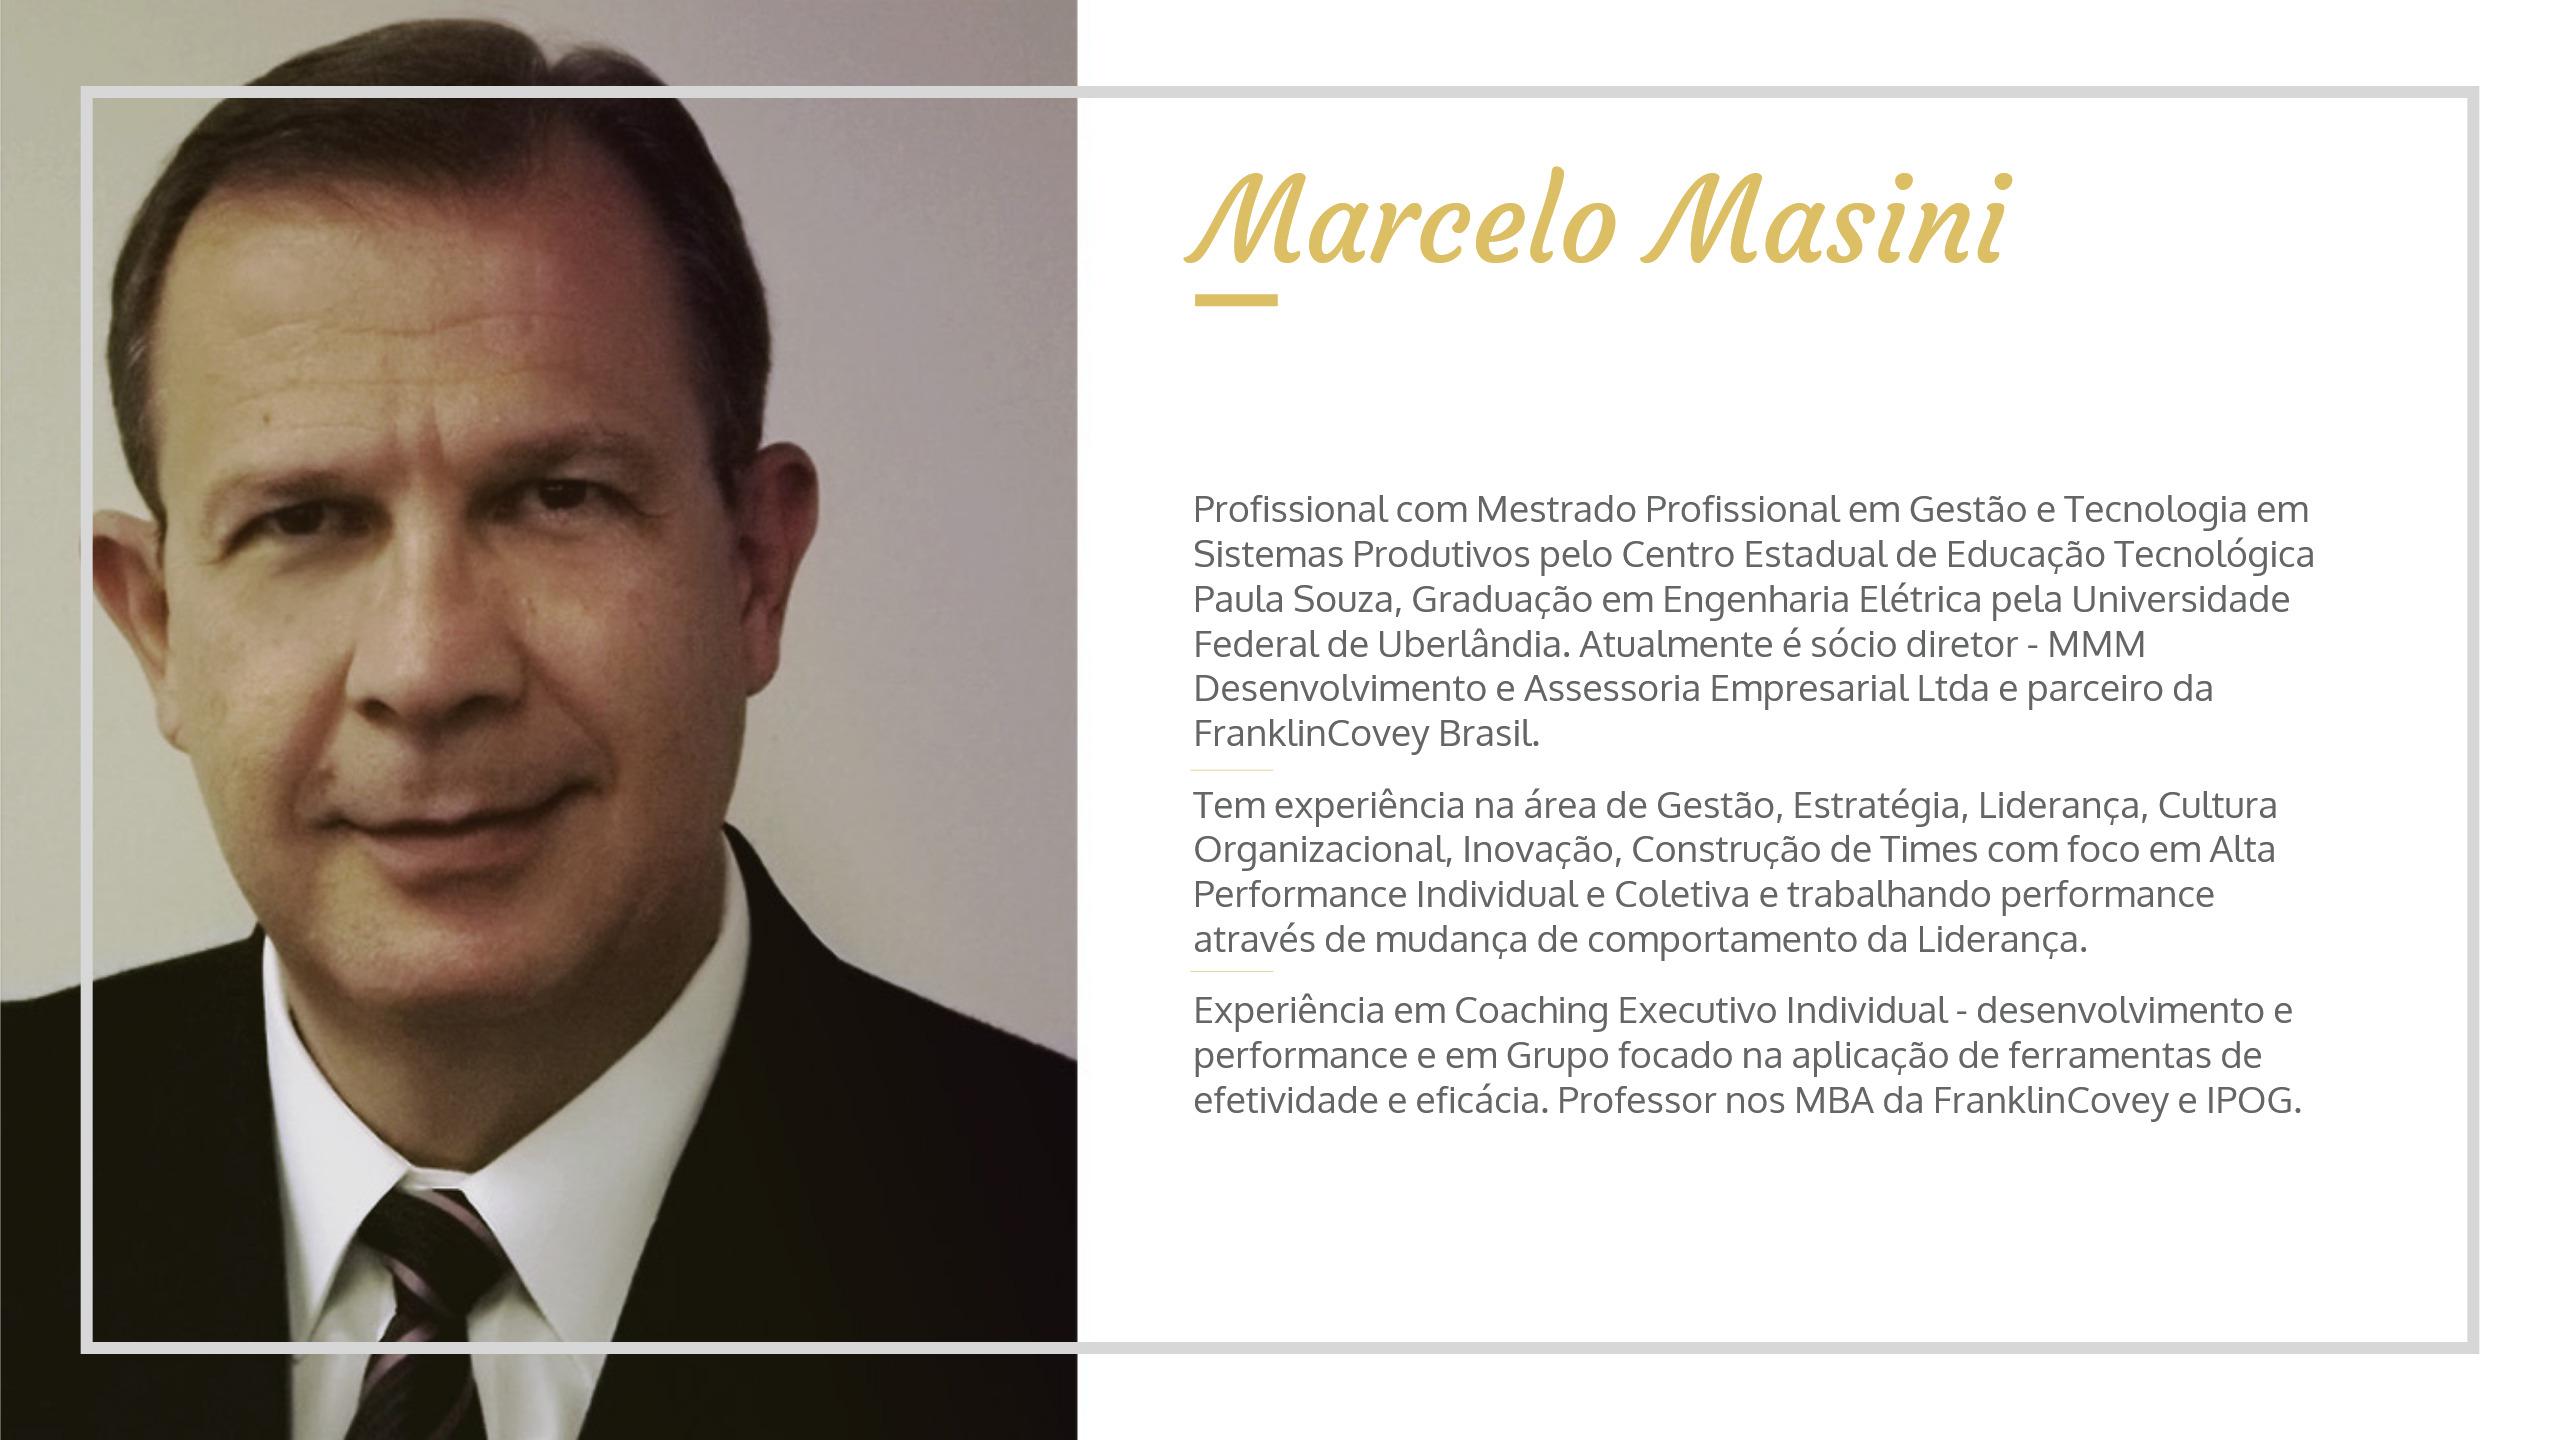 MarceloMasini